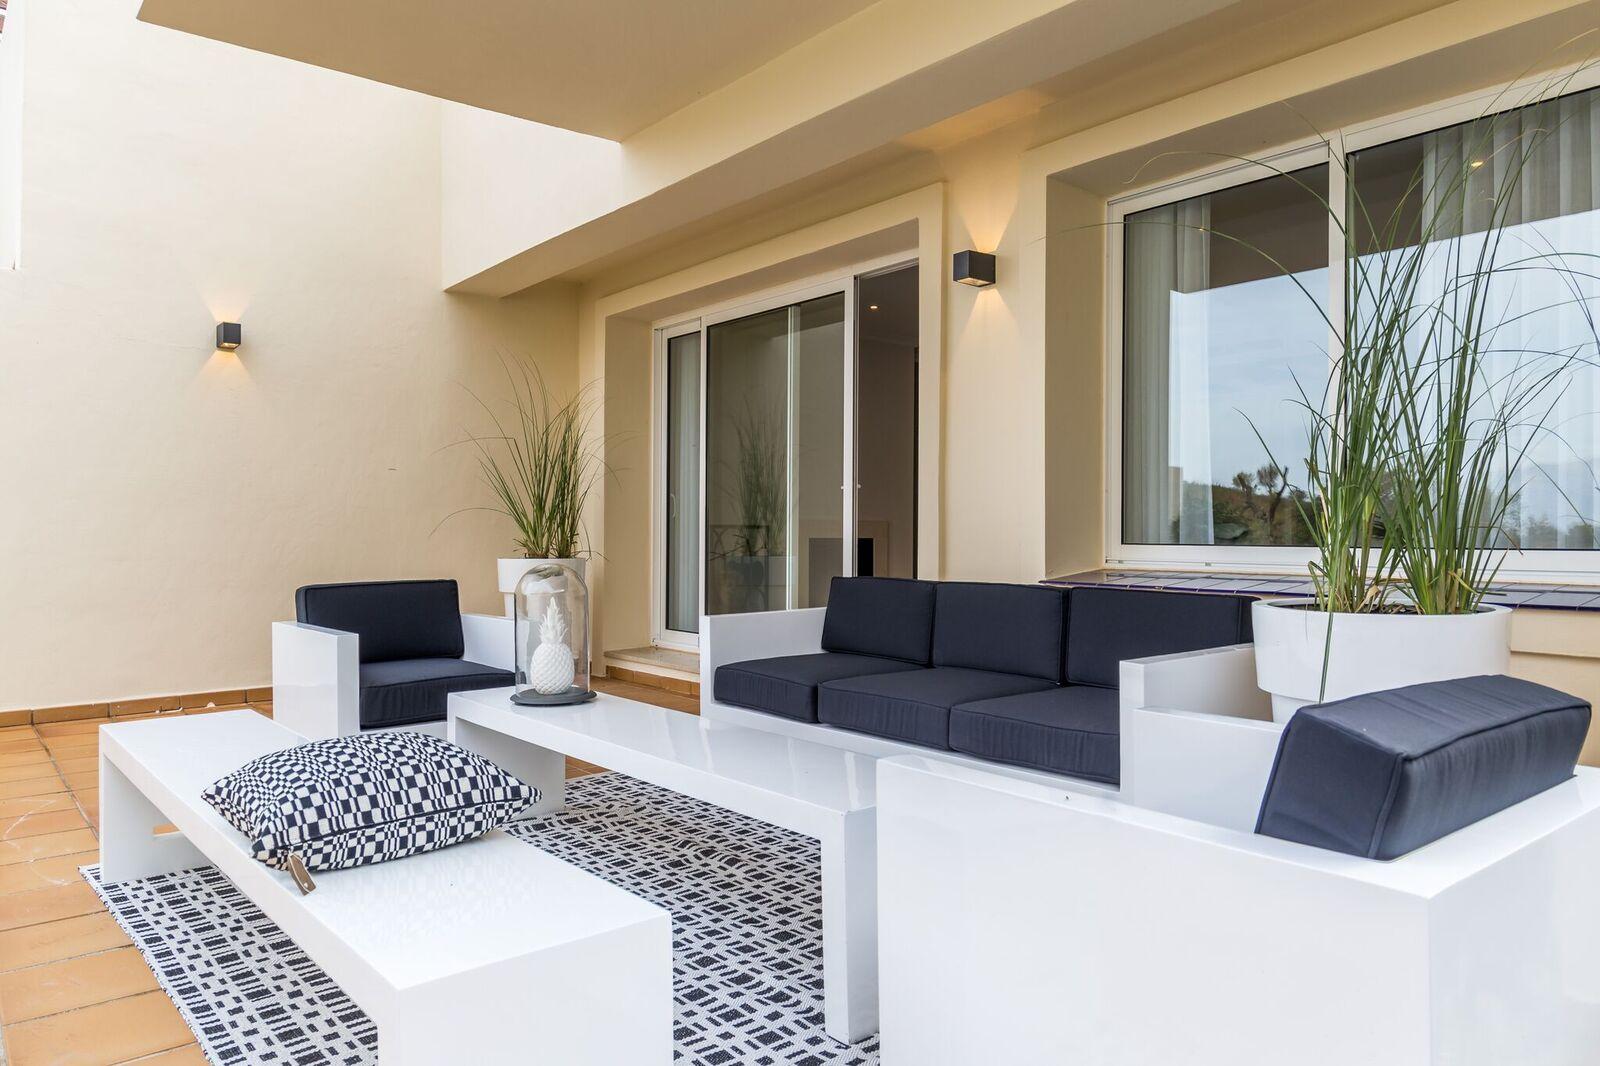 La-Mairena-Terrace-Exterior-4